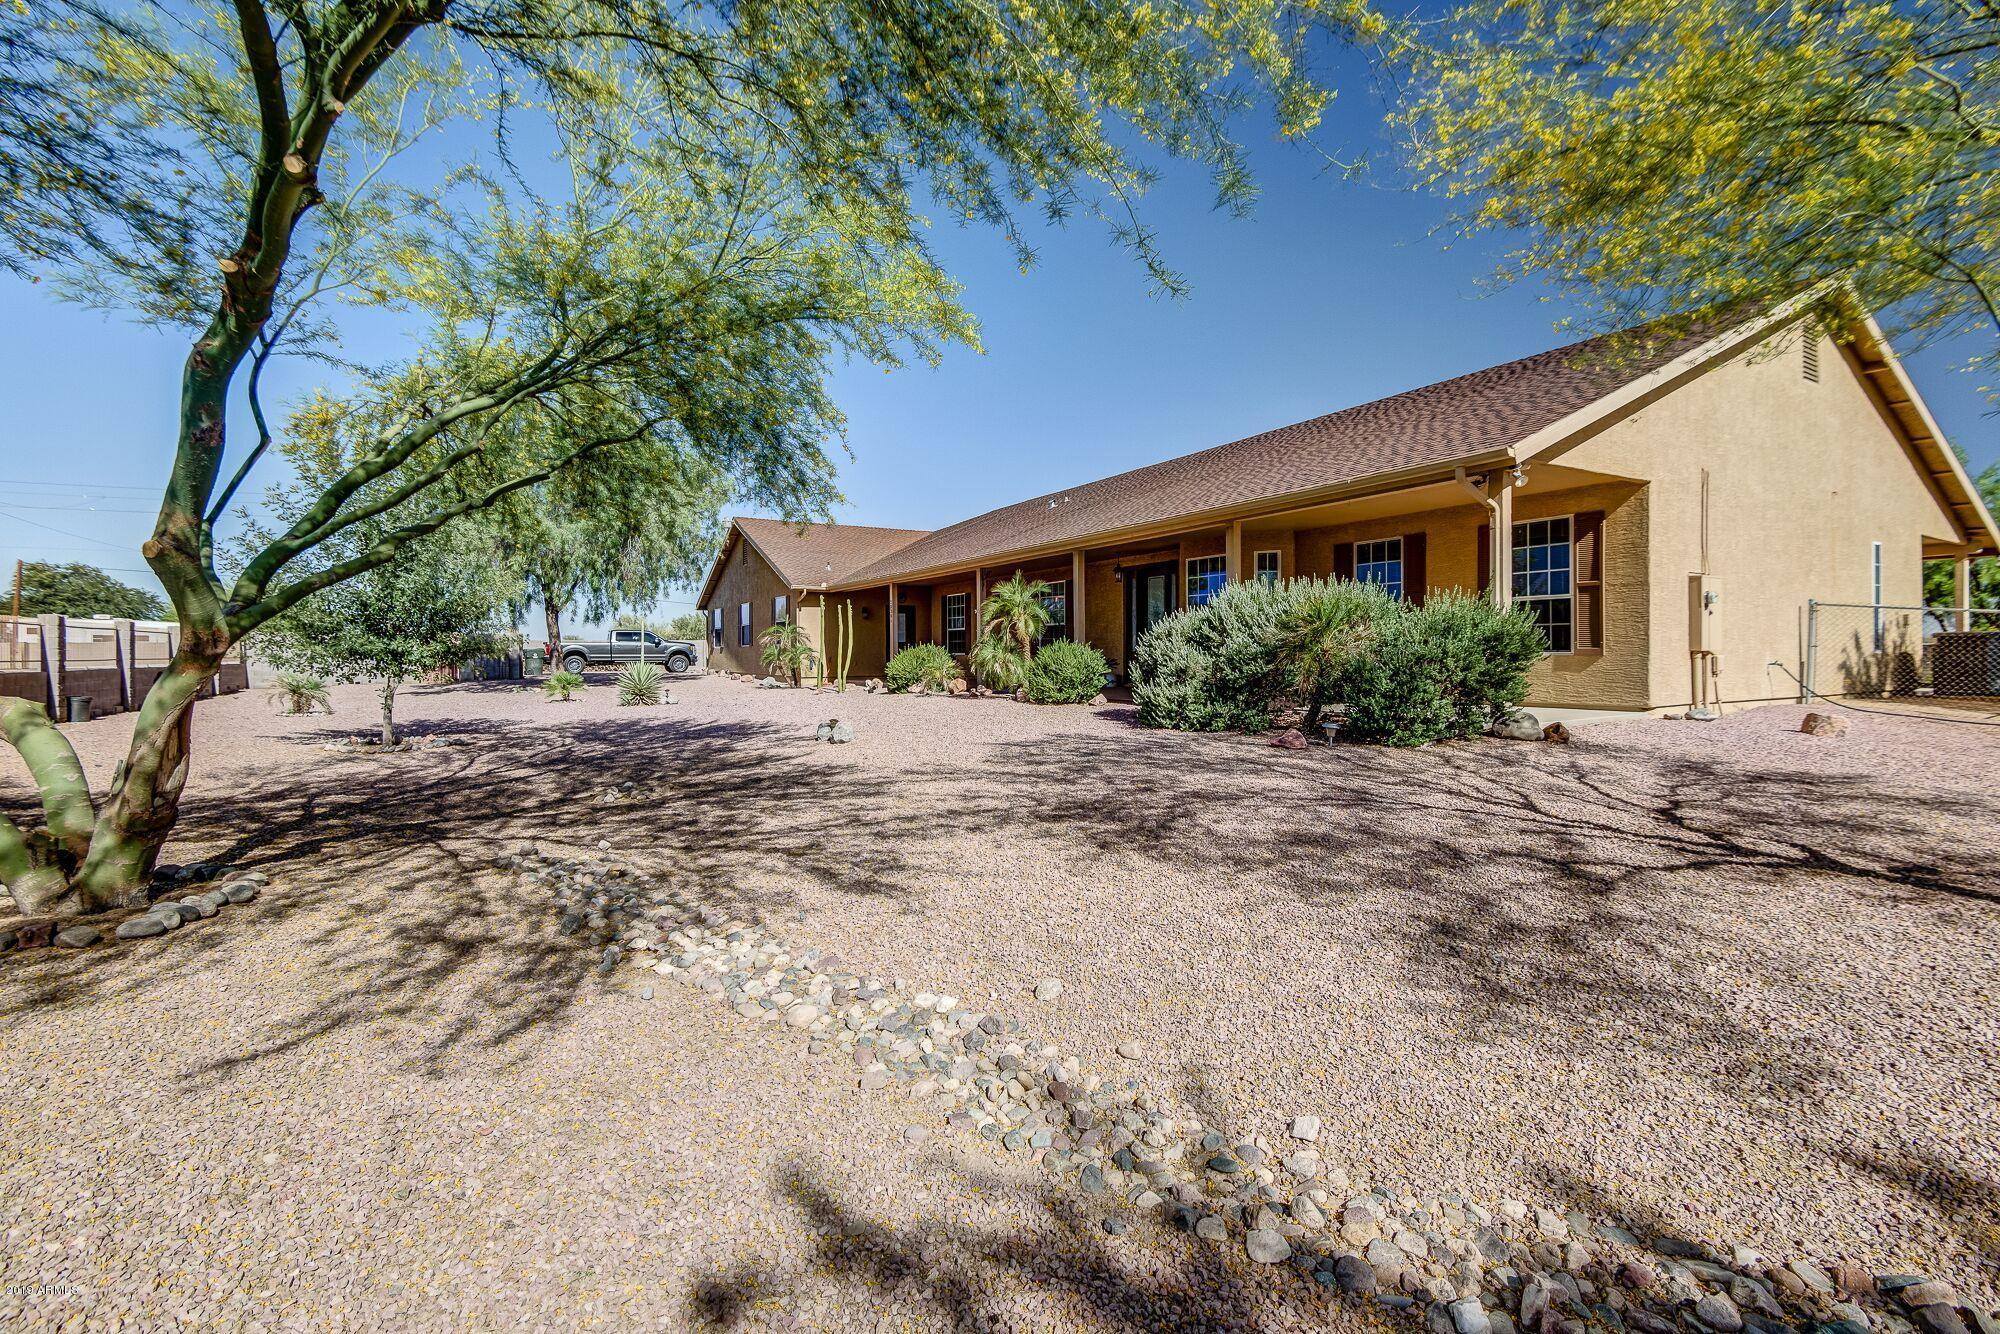 Photo of 20305 W PEAK VIEW Road, Wittmann, AZ 85361